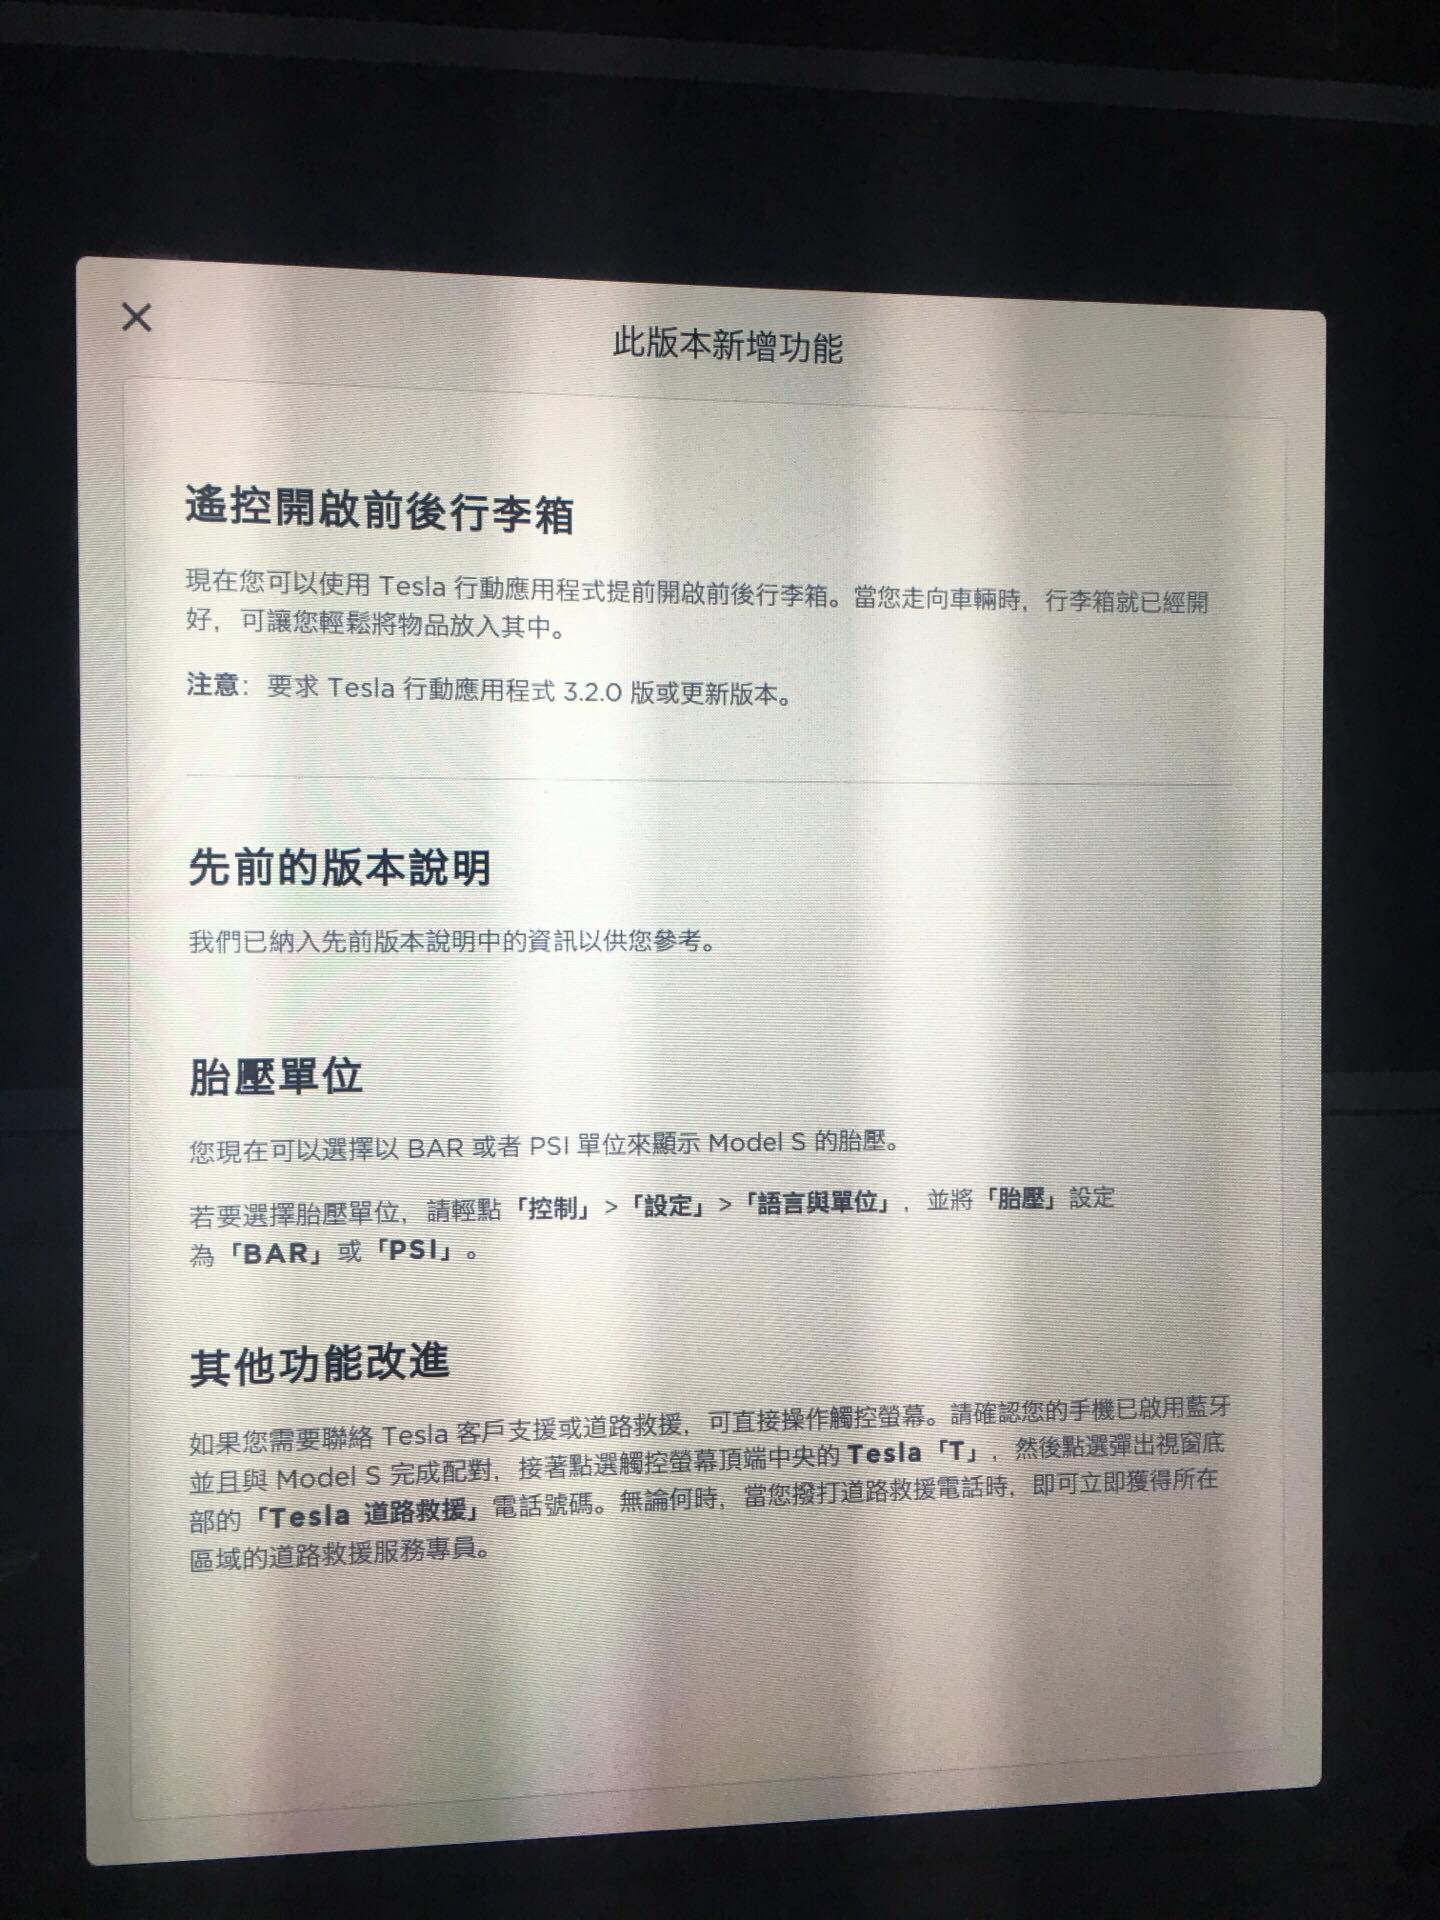 Model S 2018.12 release notes Taiwan [Credit: Michael Hsu/Facebook]